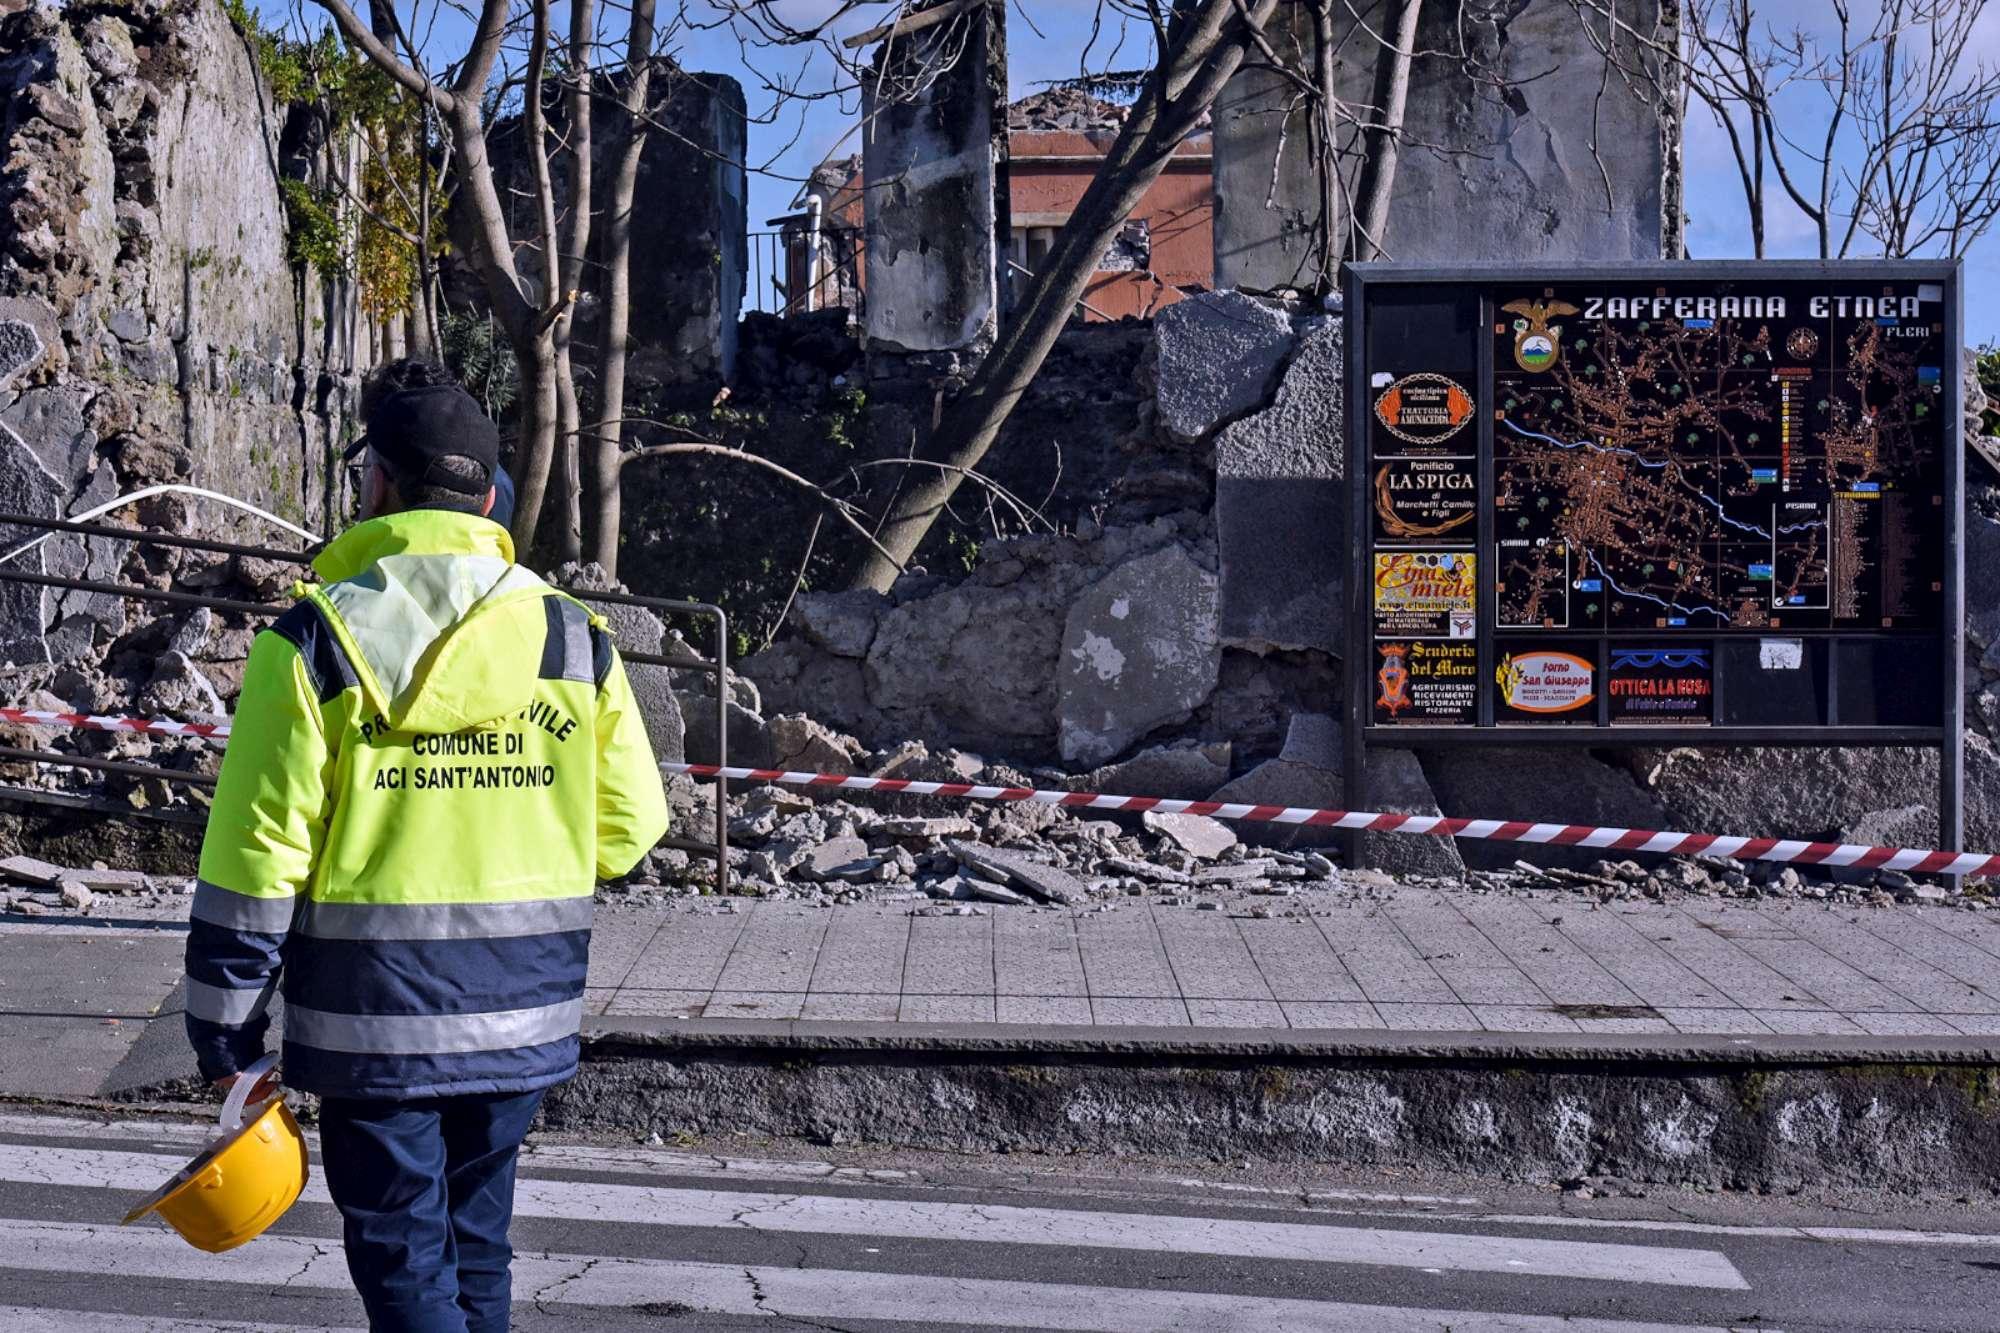 Sisma a Catania, gravi danni a Fleri (Zafferana Etnea)